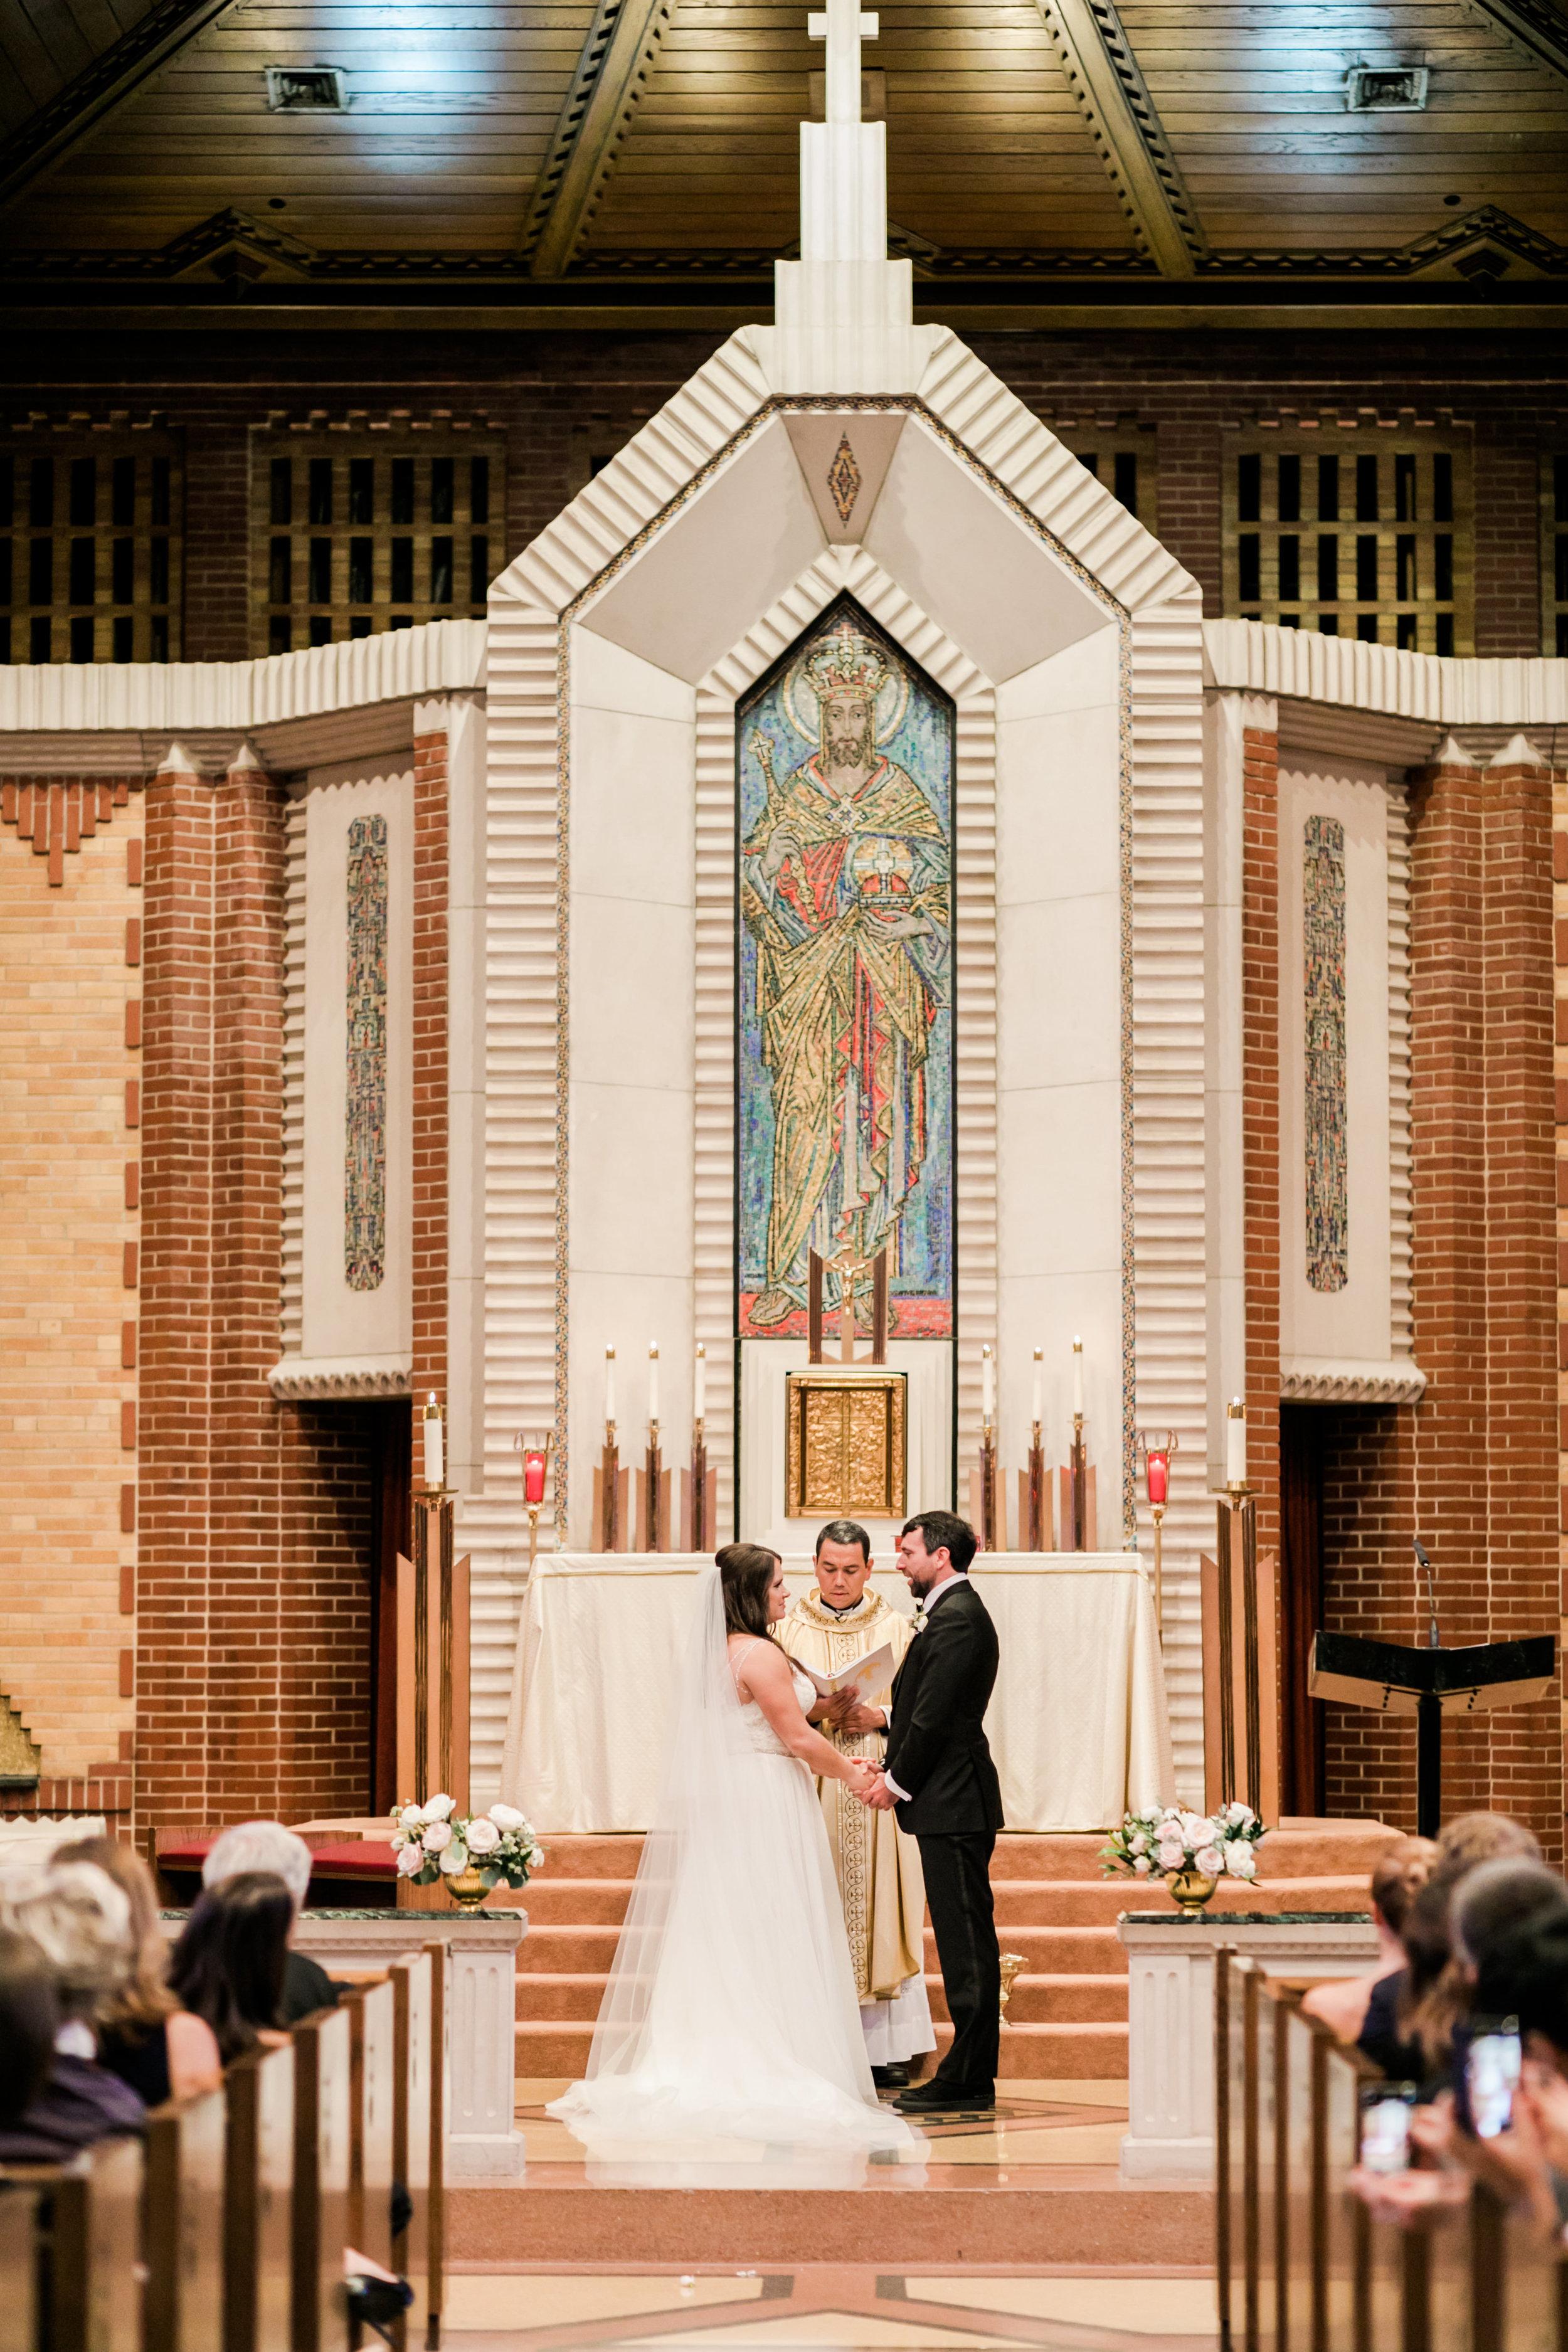 The Mansion at Woodward Park Tulsa Oklahoma Wedding_Valorie Darling Photography-9077.jpg